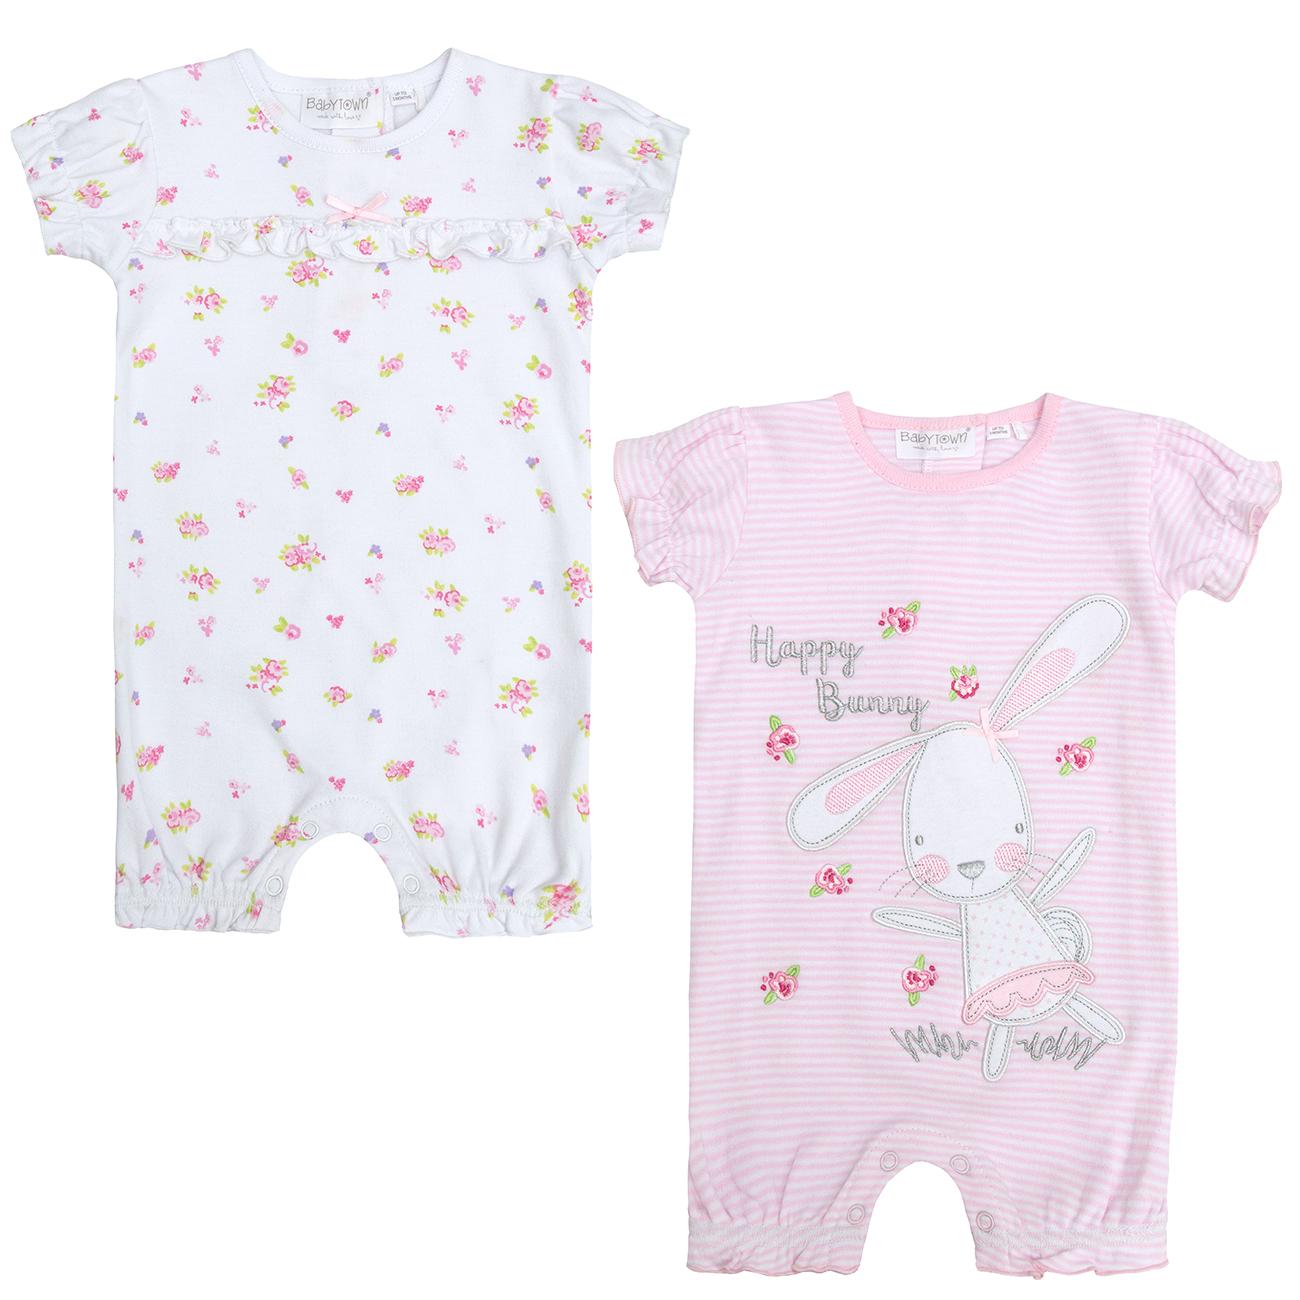 Newborn Infant Baby Girls Bunny Sleepsuit Set Cradle Cute Cap Hat NB 9 Months